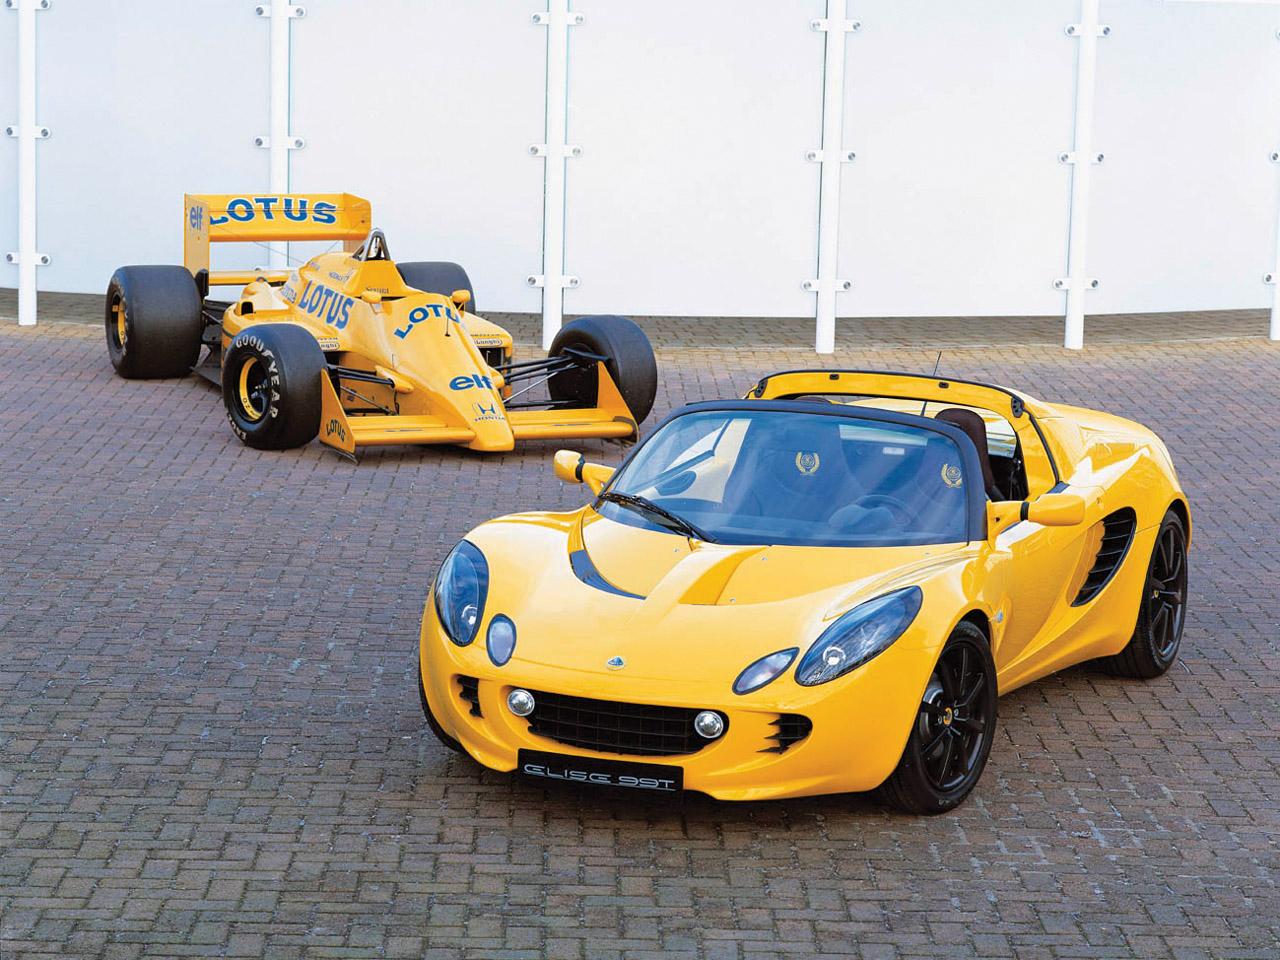 lotus2 Γνώρισε το νέο, καταπληκτικό, αφεντικό της Lotus Lotus, Volvo, zblog, αυτοκίνητα, καινούρια, μεταχειρισμένα